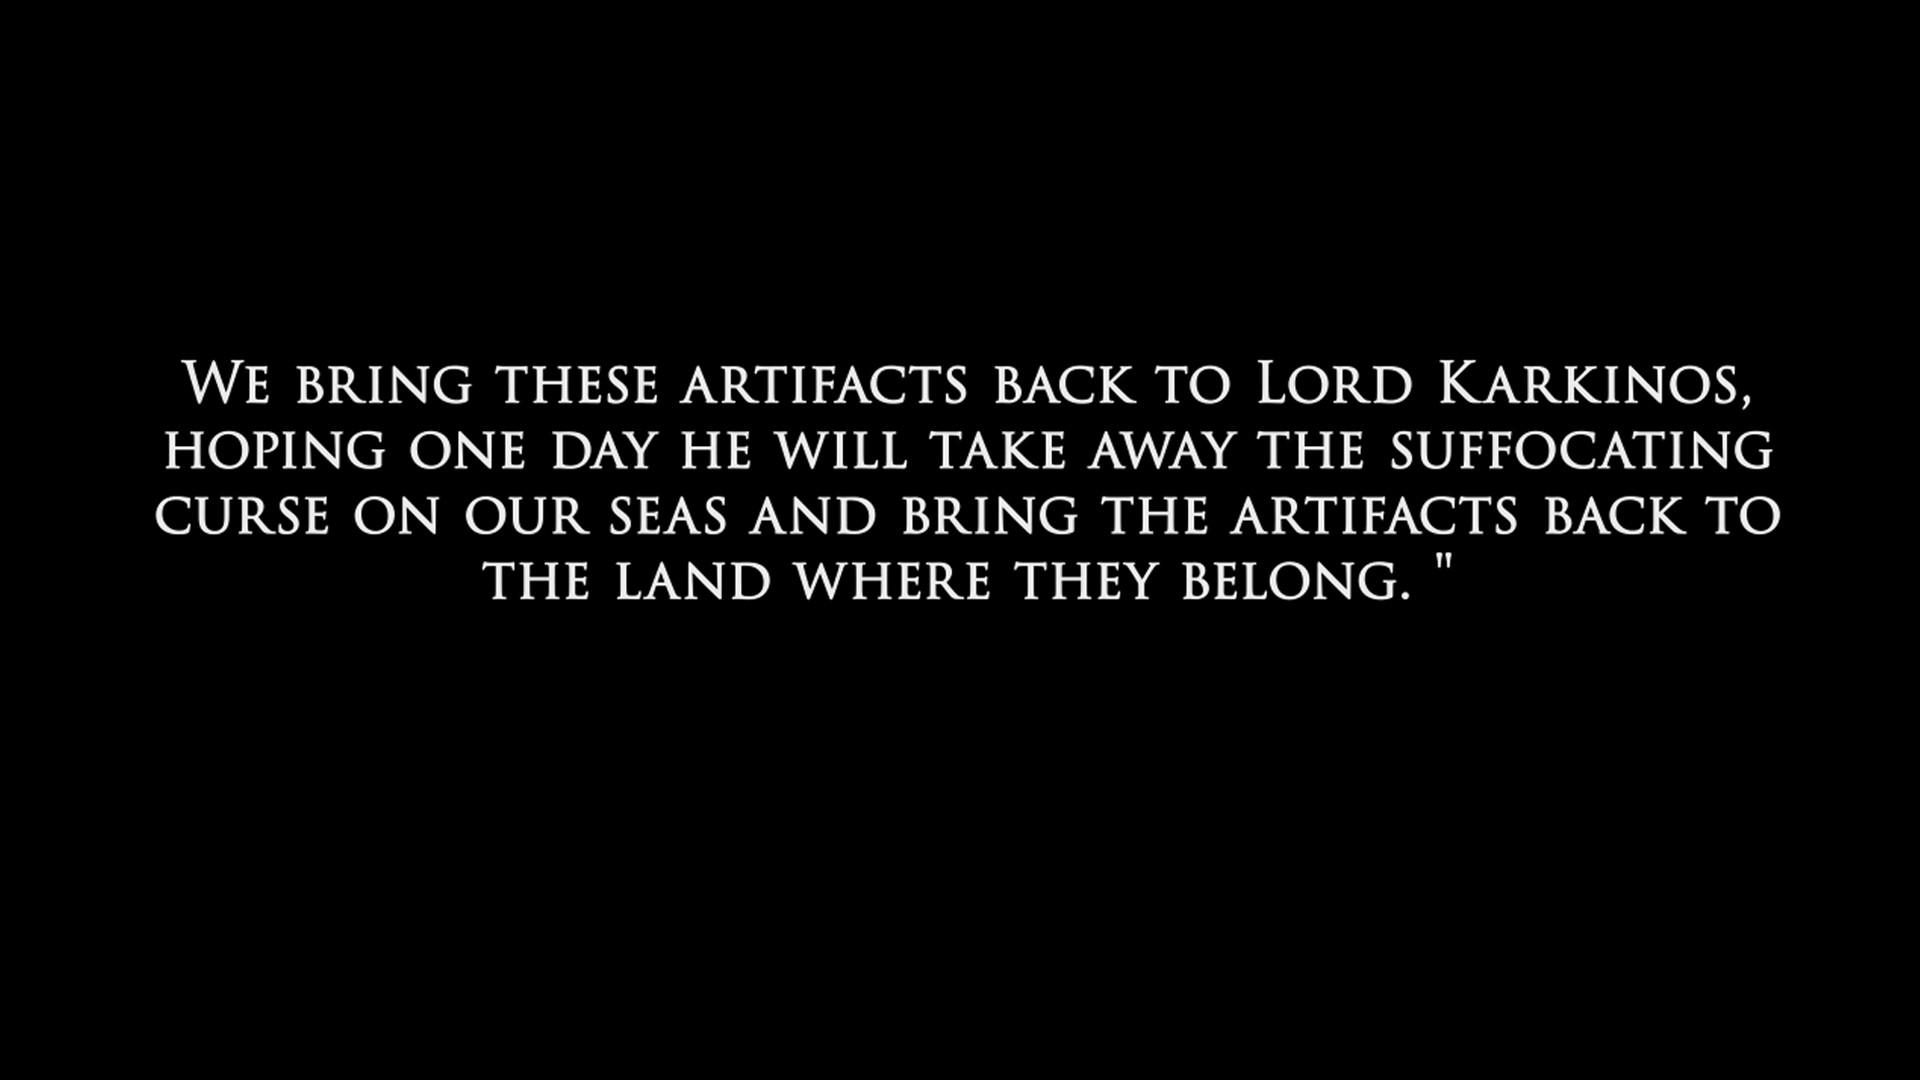 Martin pietras text 3